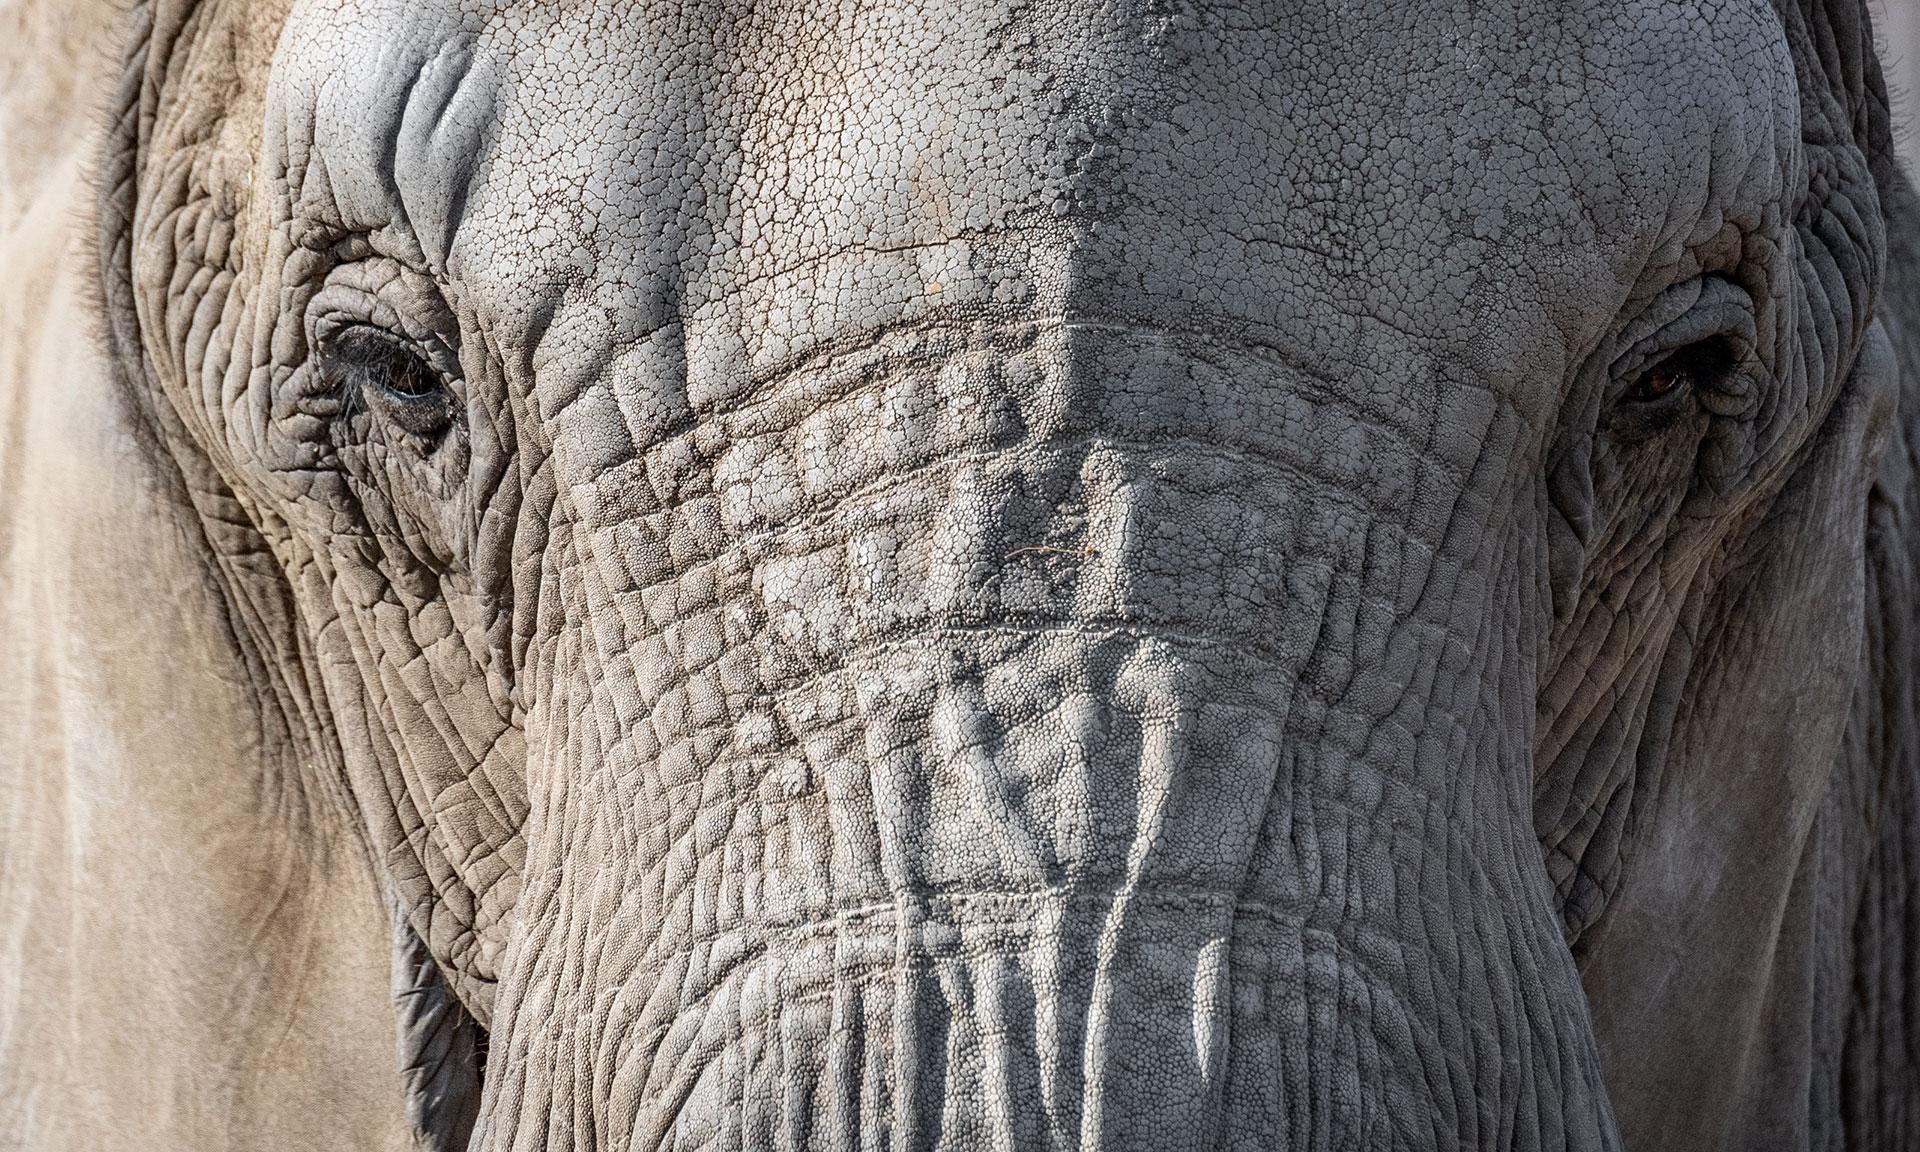 elephant eyes portrait